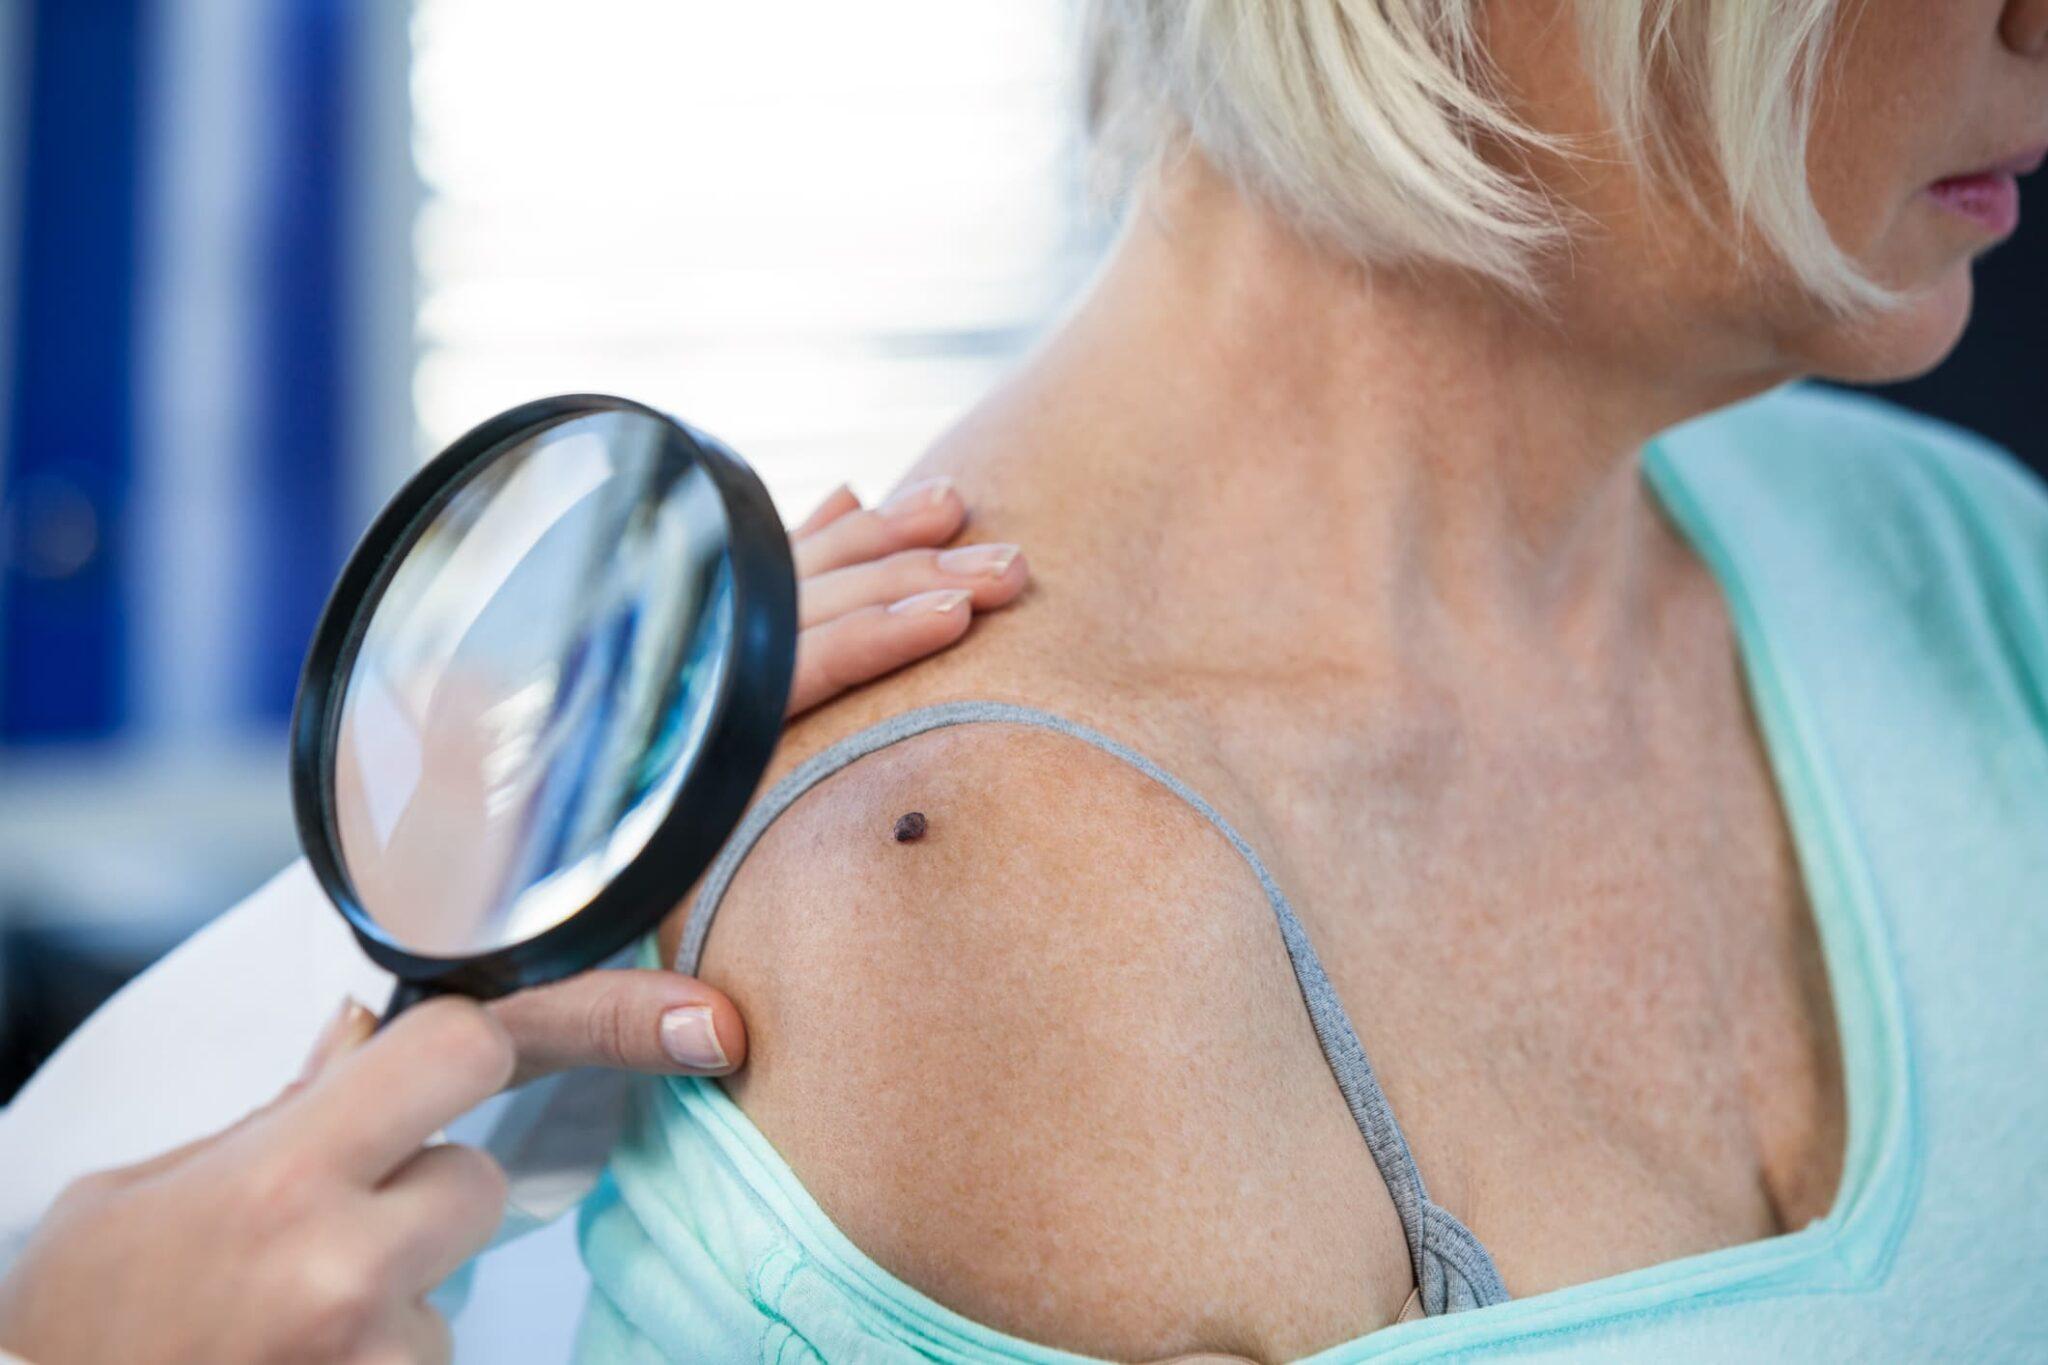 Skin Cancer Warning Signs